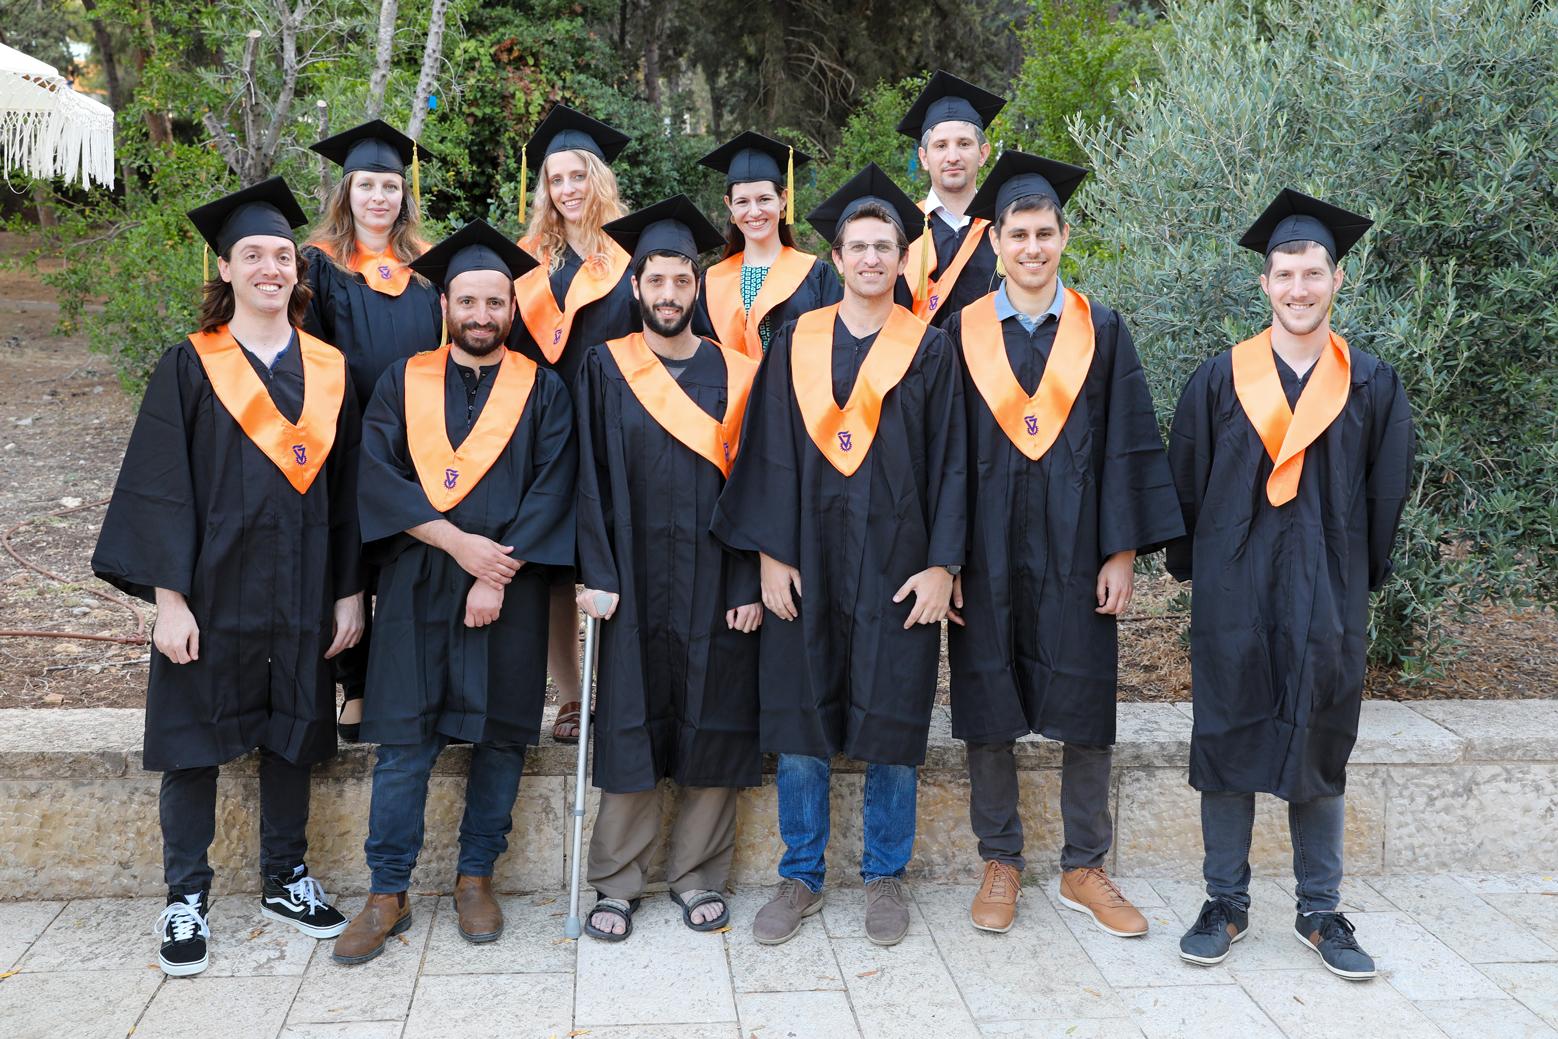 Image of graduates